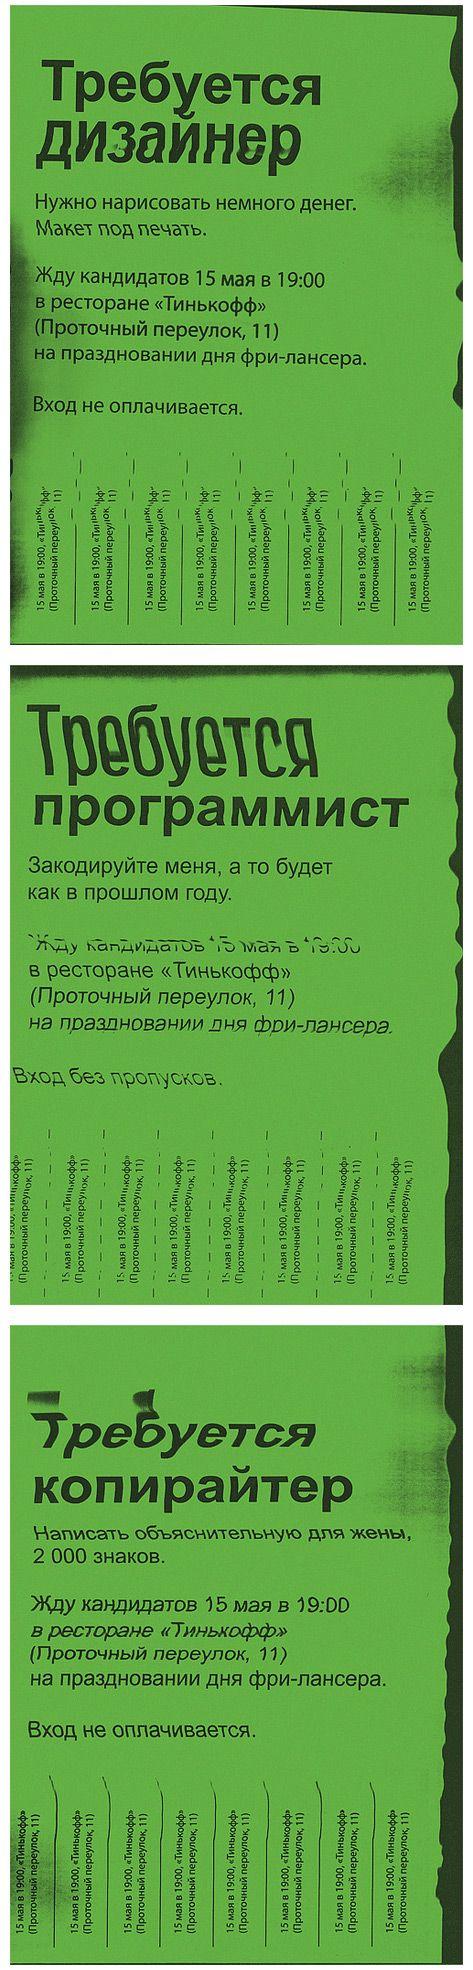 Промо для Free-lance party, Прочее © СтасПоляков